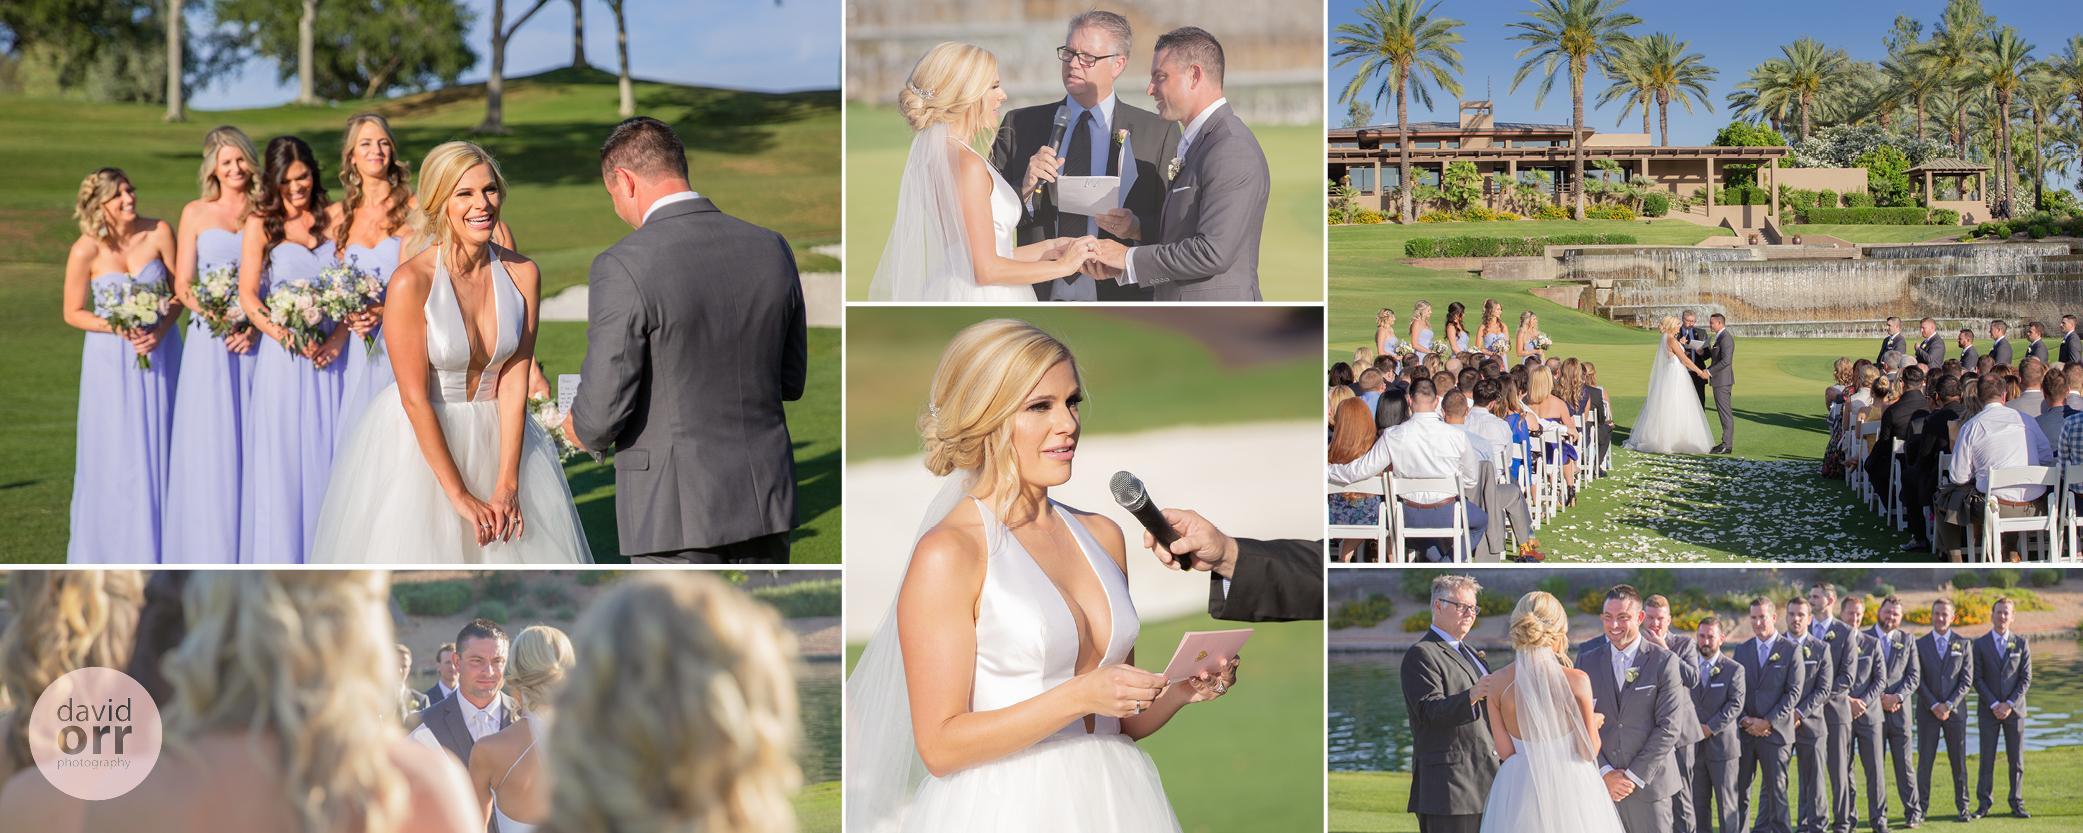 DavidOrrPhotography_Gainey-Ranch-Wedding-Vows.jpg